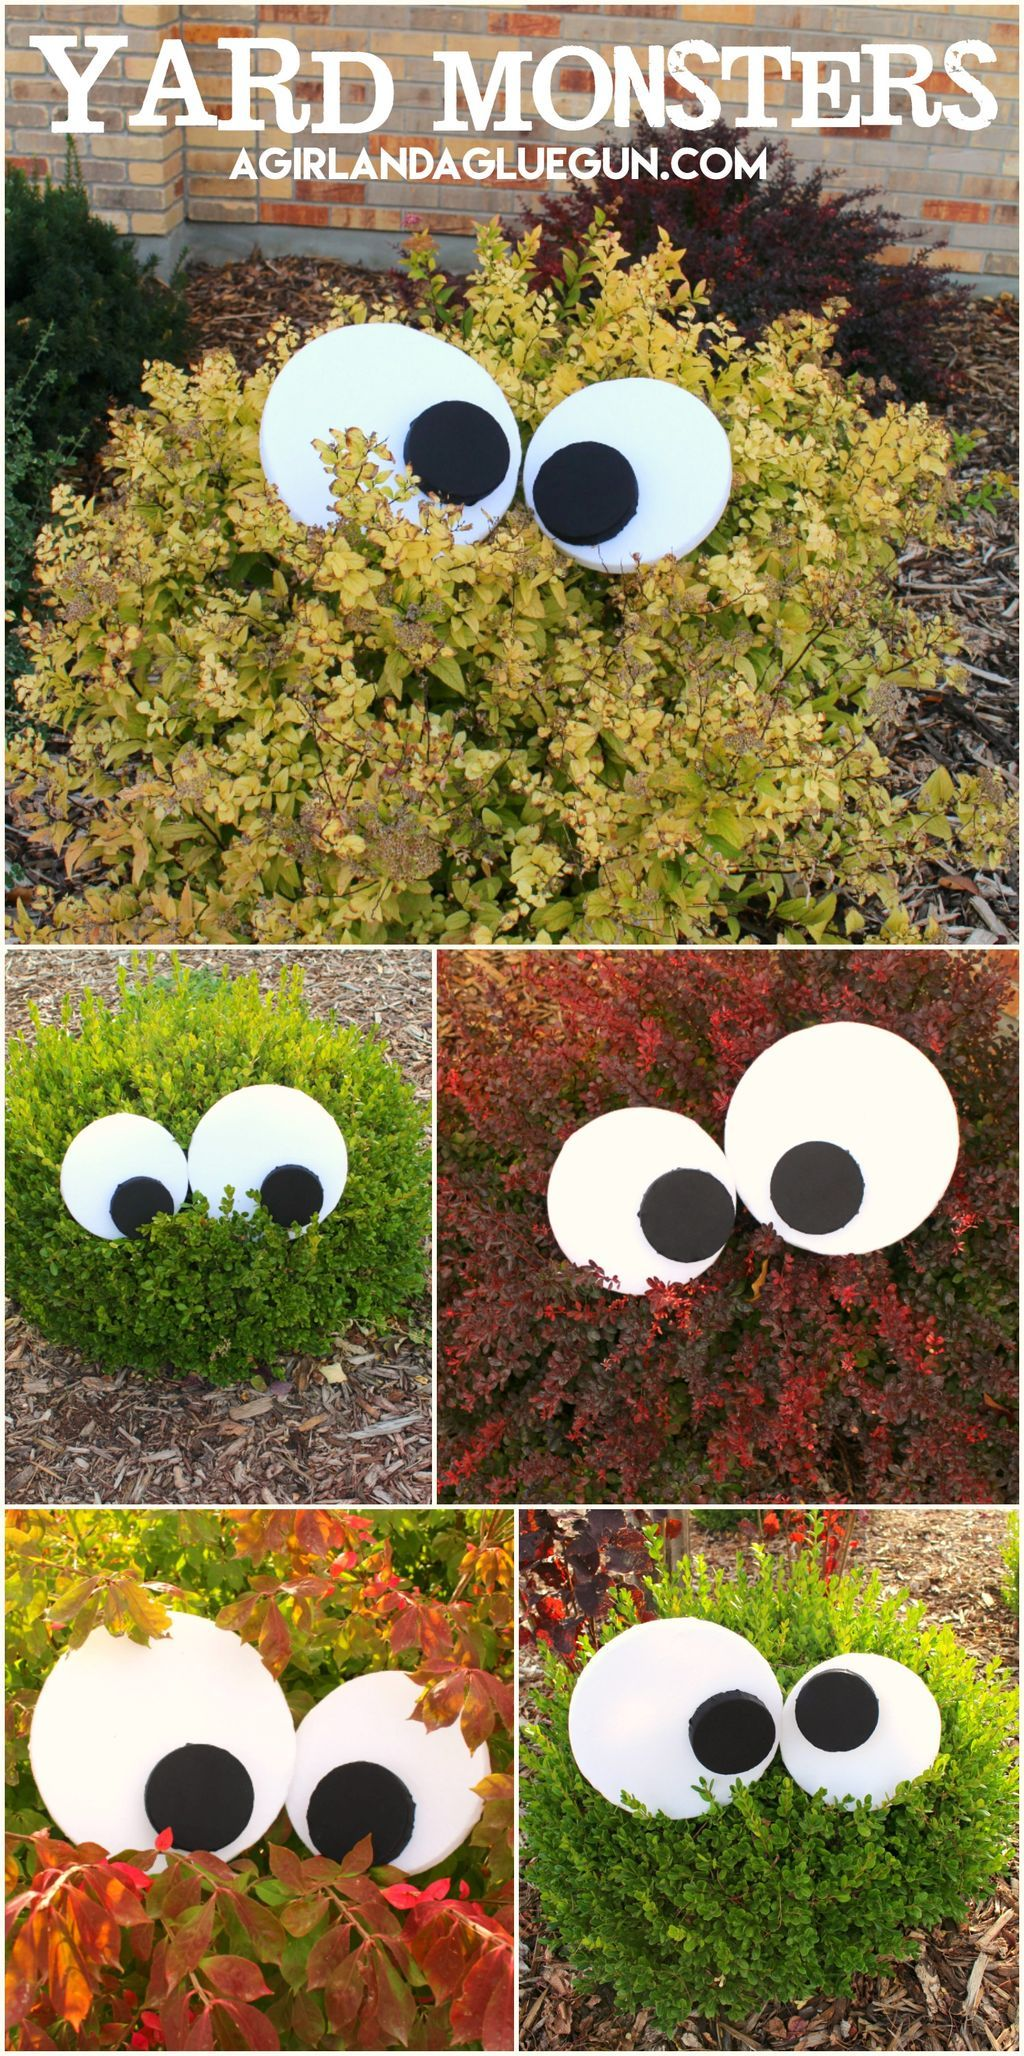 51 Creepy But Creative Diy Halloween Outdoor Decoration Ideas Halloween Outdoor Decorations Monster Decorations Fun Halloween Decor